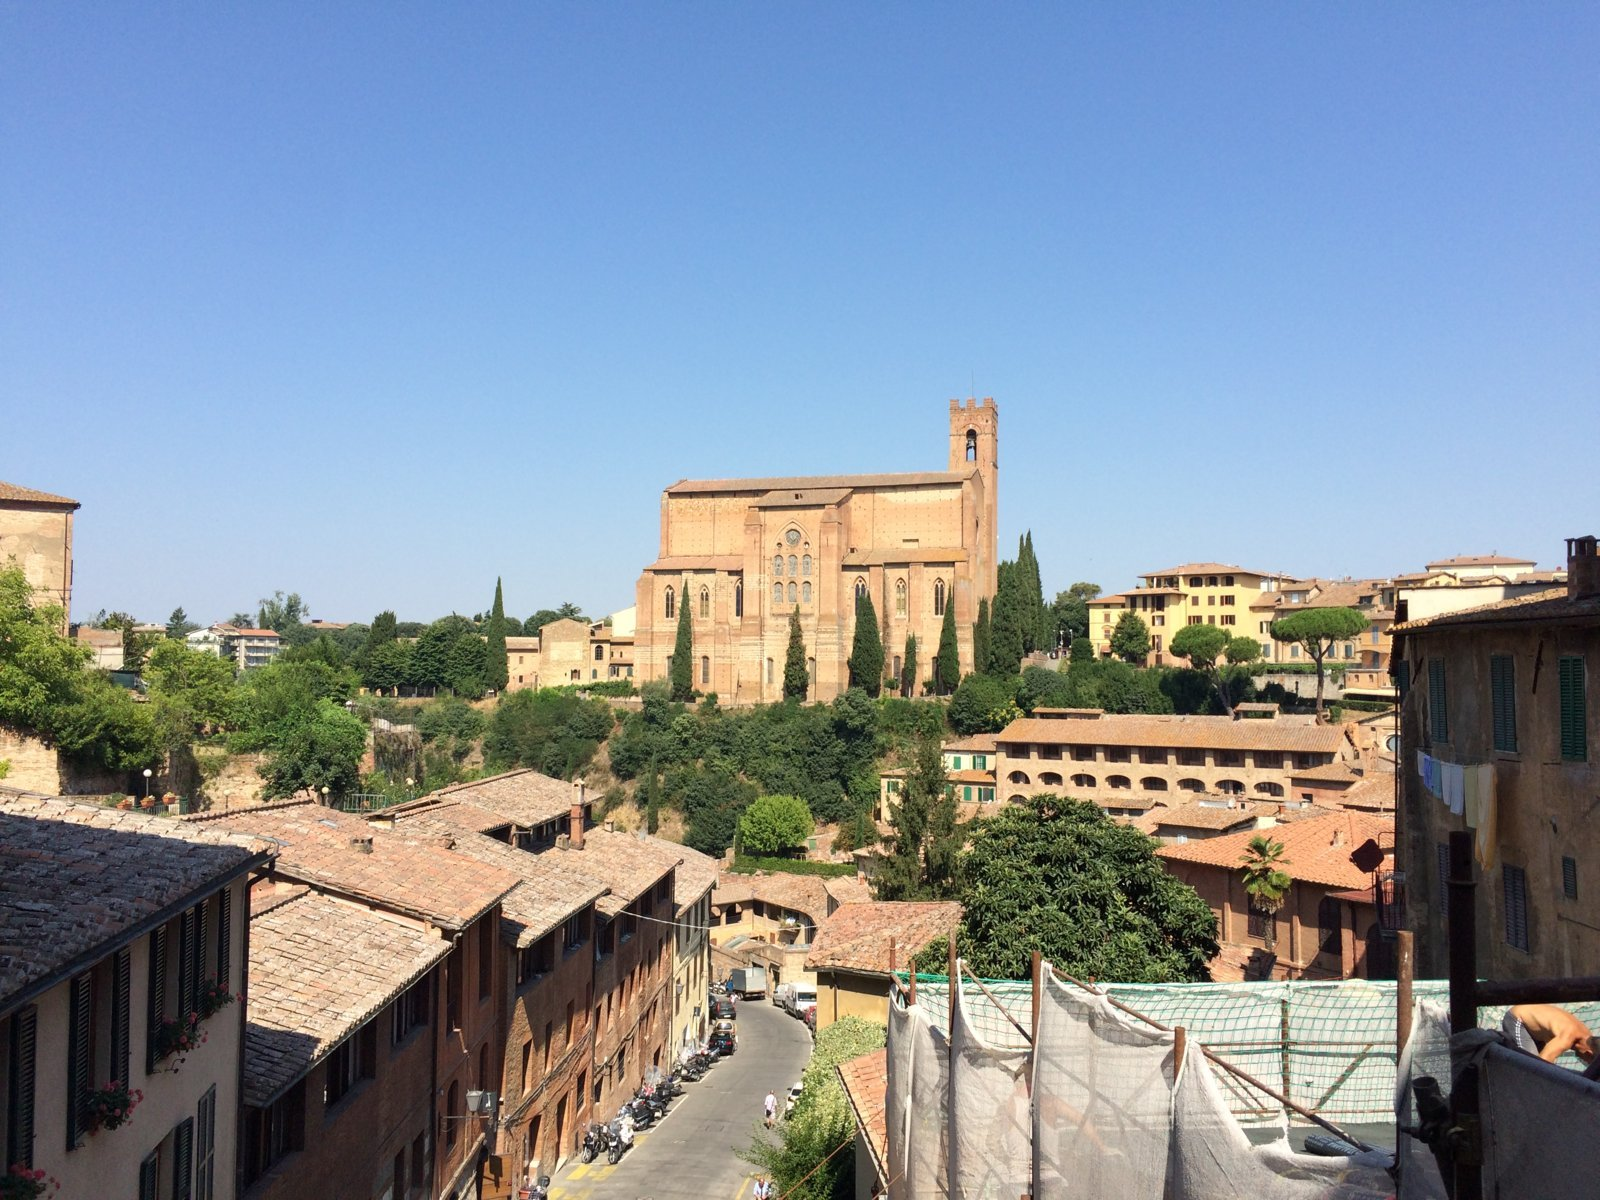 S Agostino Siena Italy